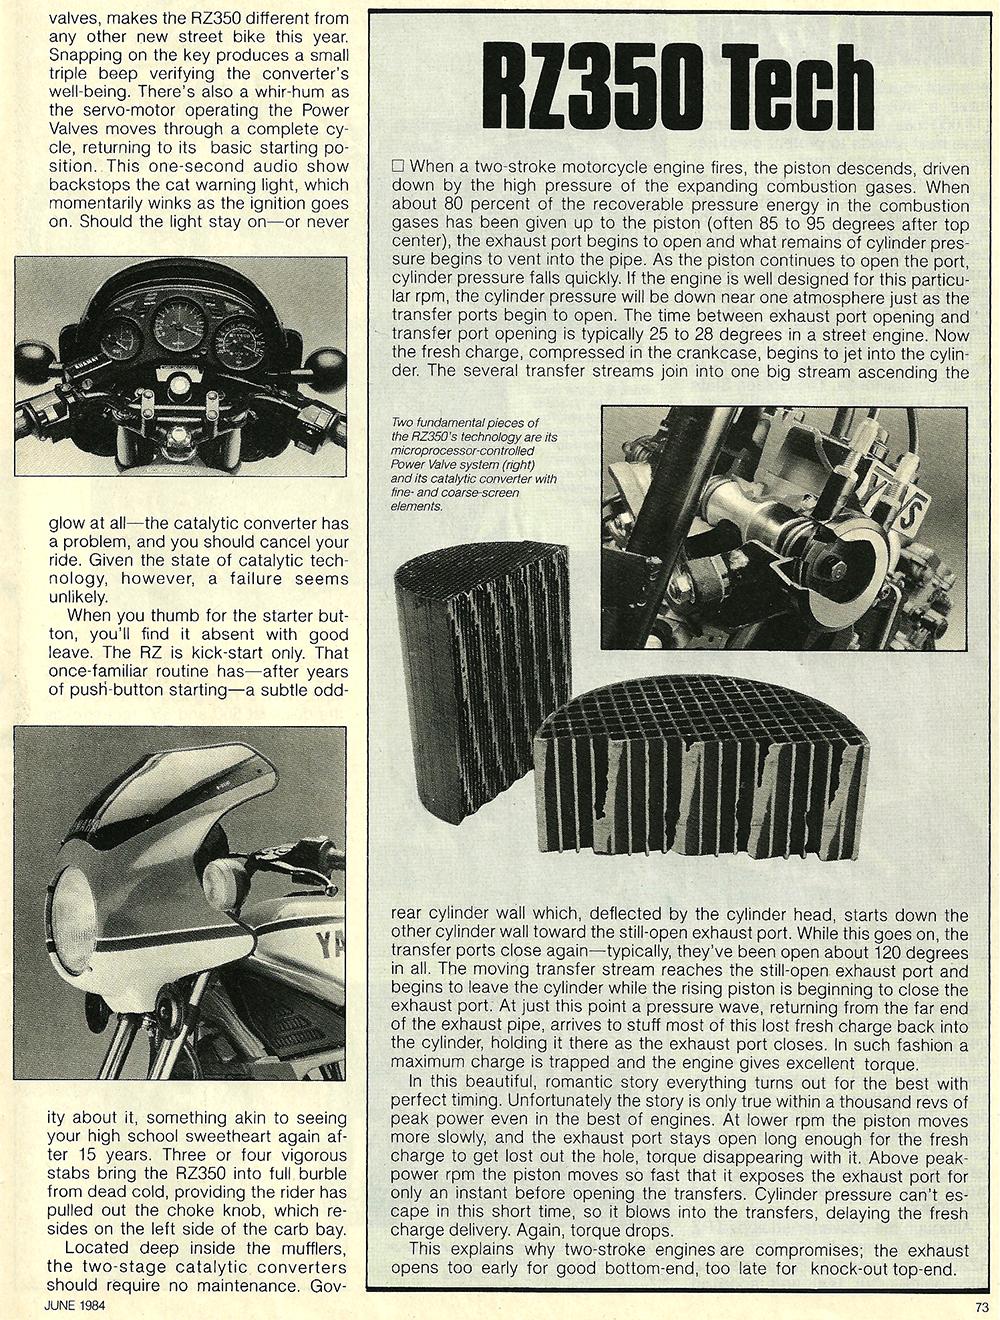 1984 Yamaha RZ350L road test 04.jpg